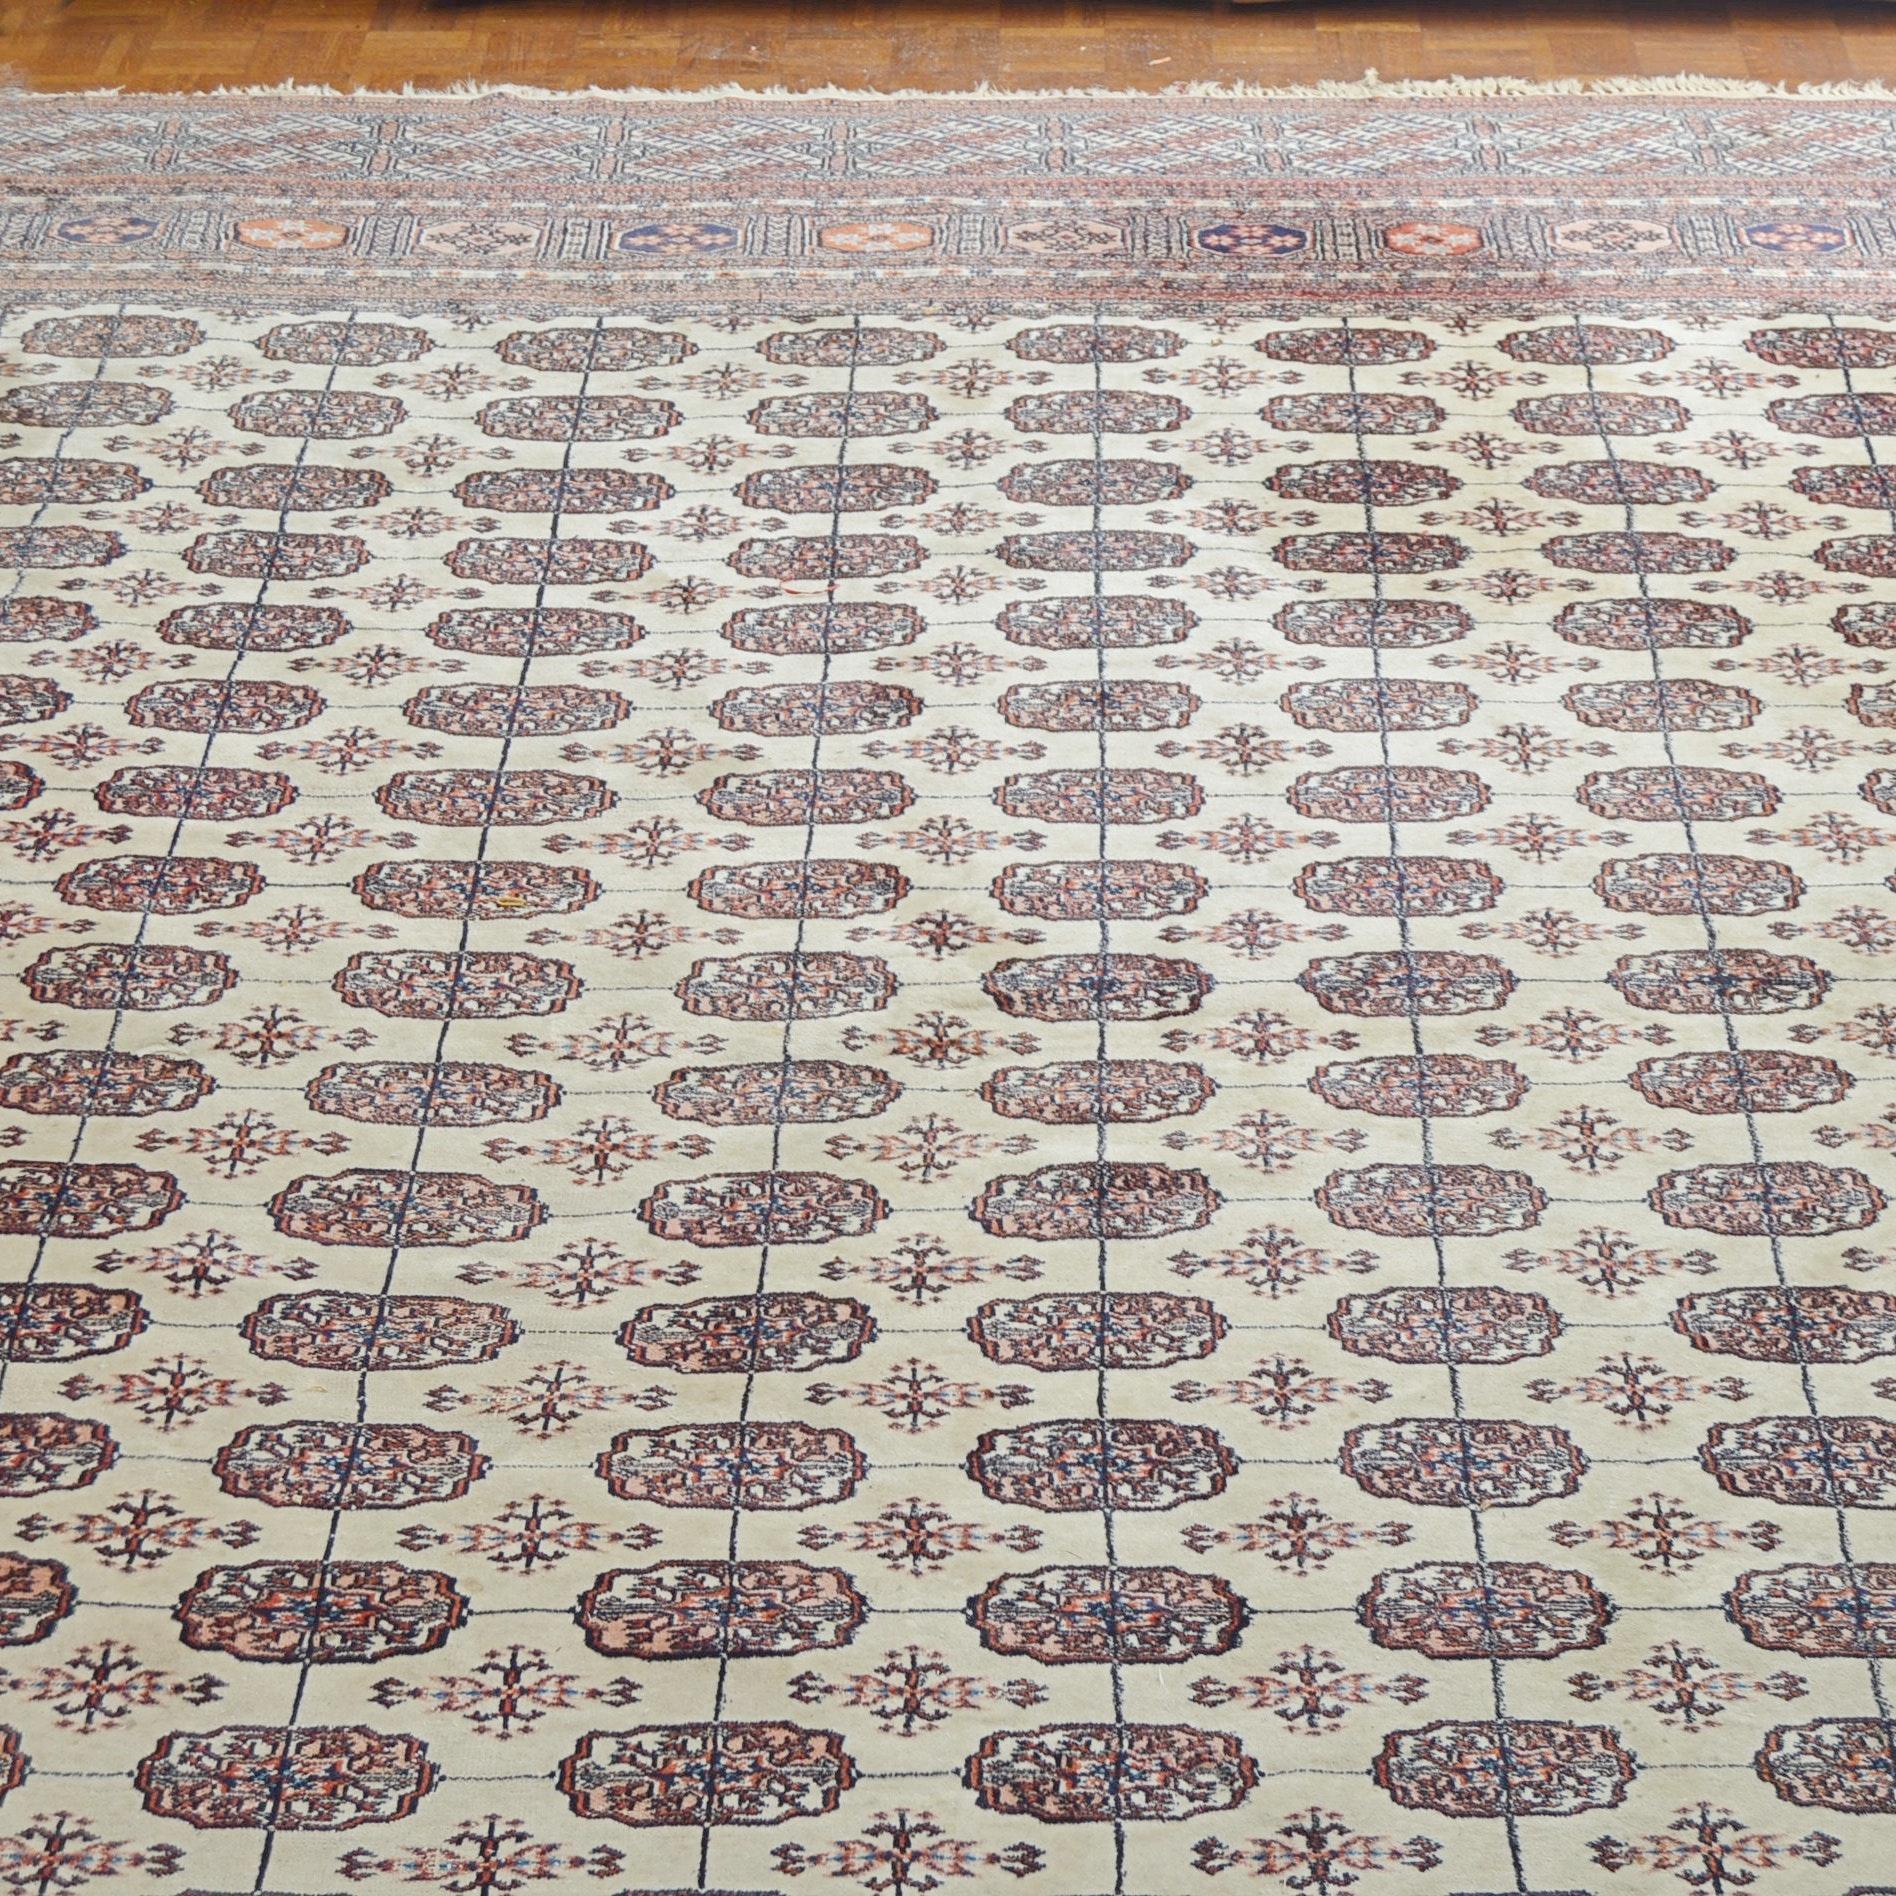 Hand-Knotted Pakistani Bokhara Wool Area Rug